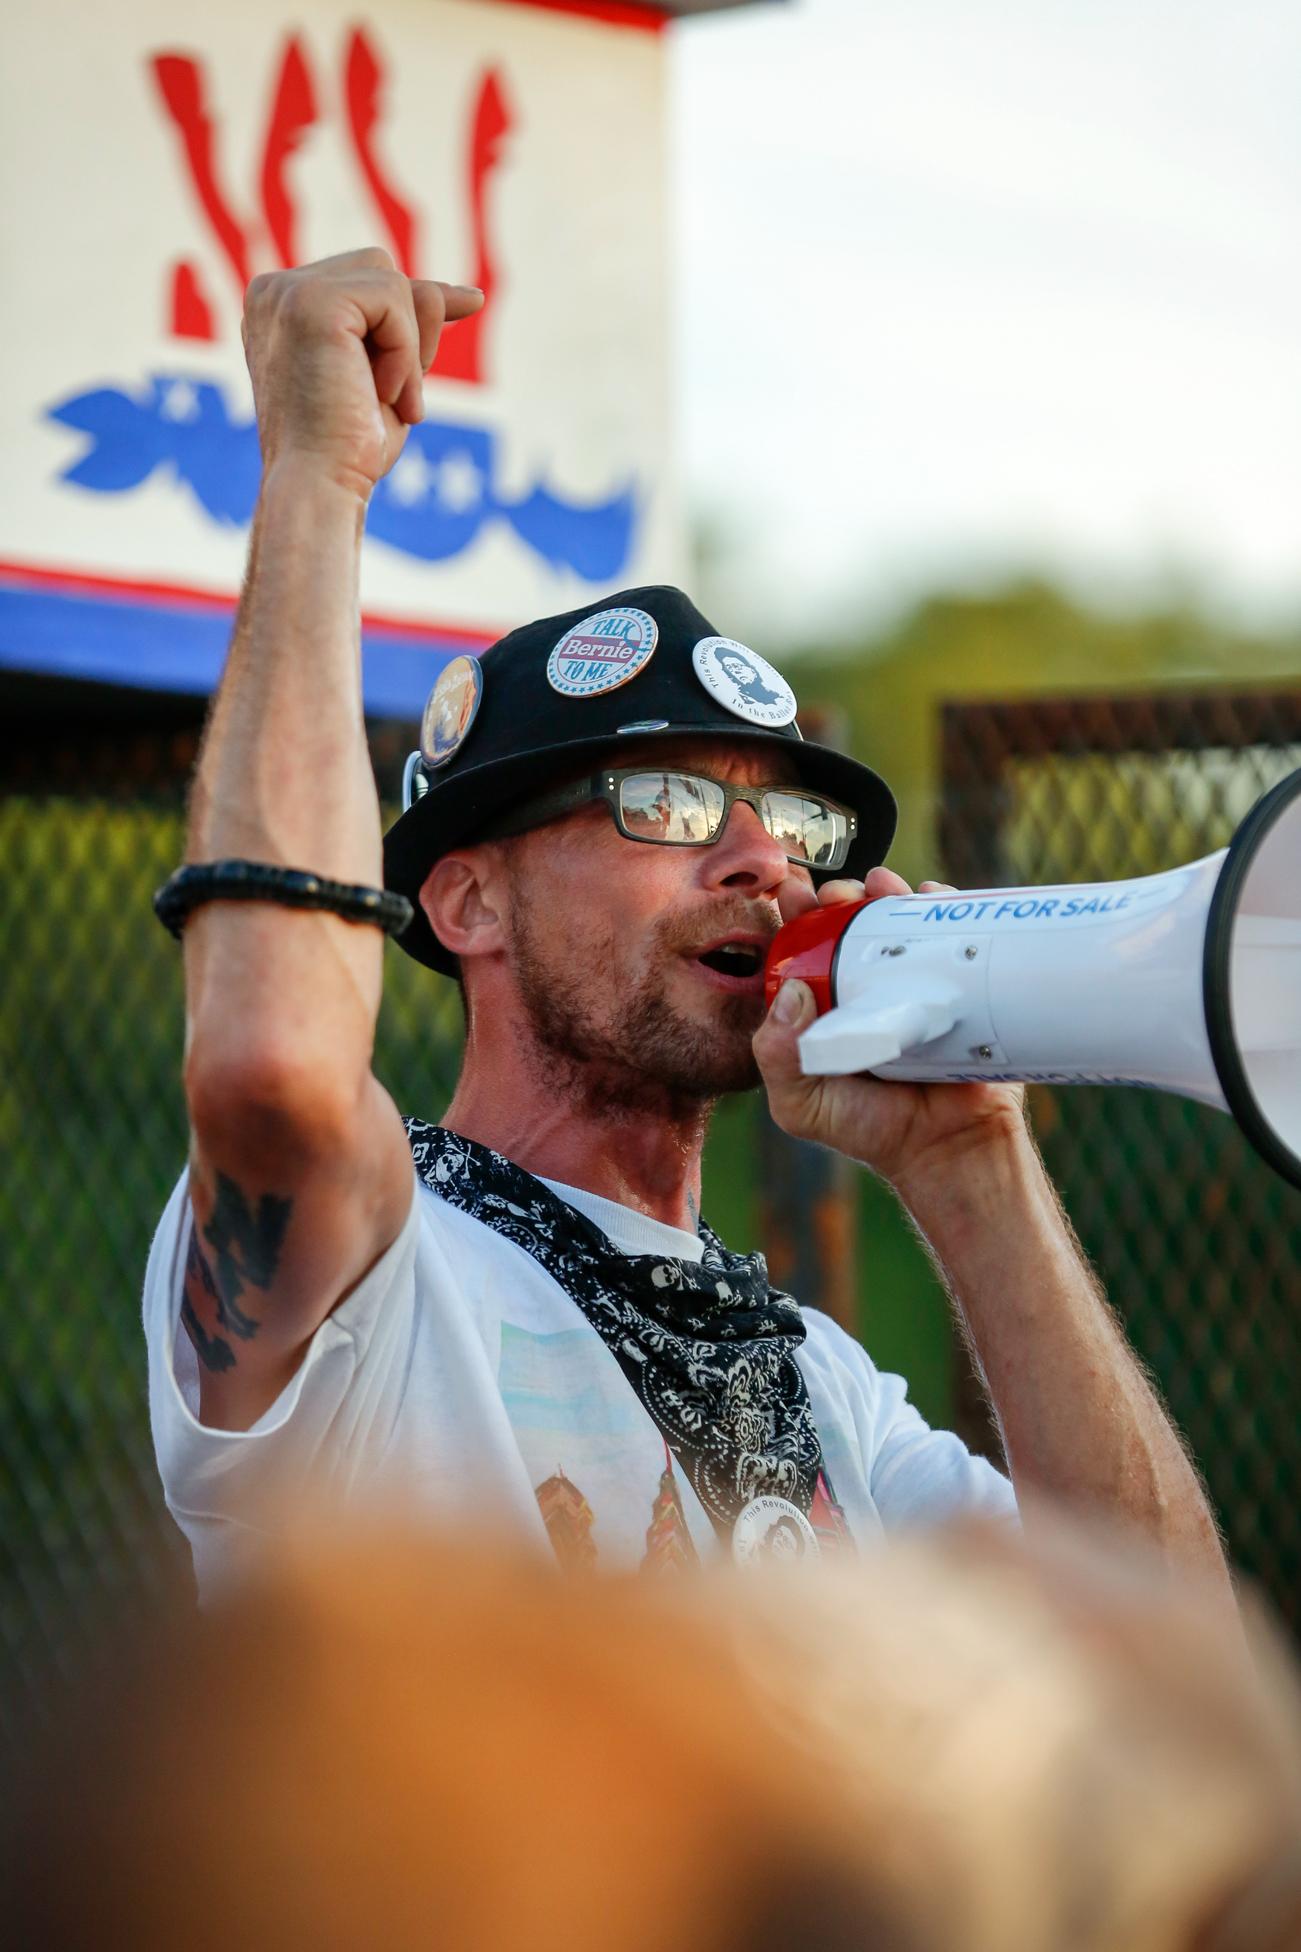 Demonstrator On Megaphone at Barricade